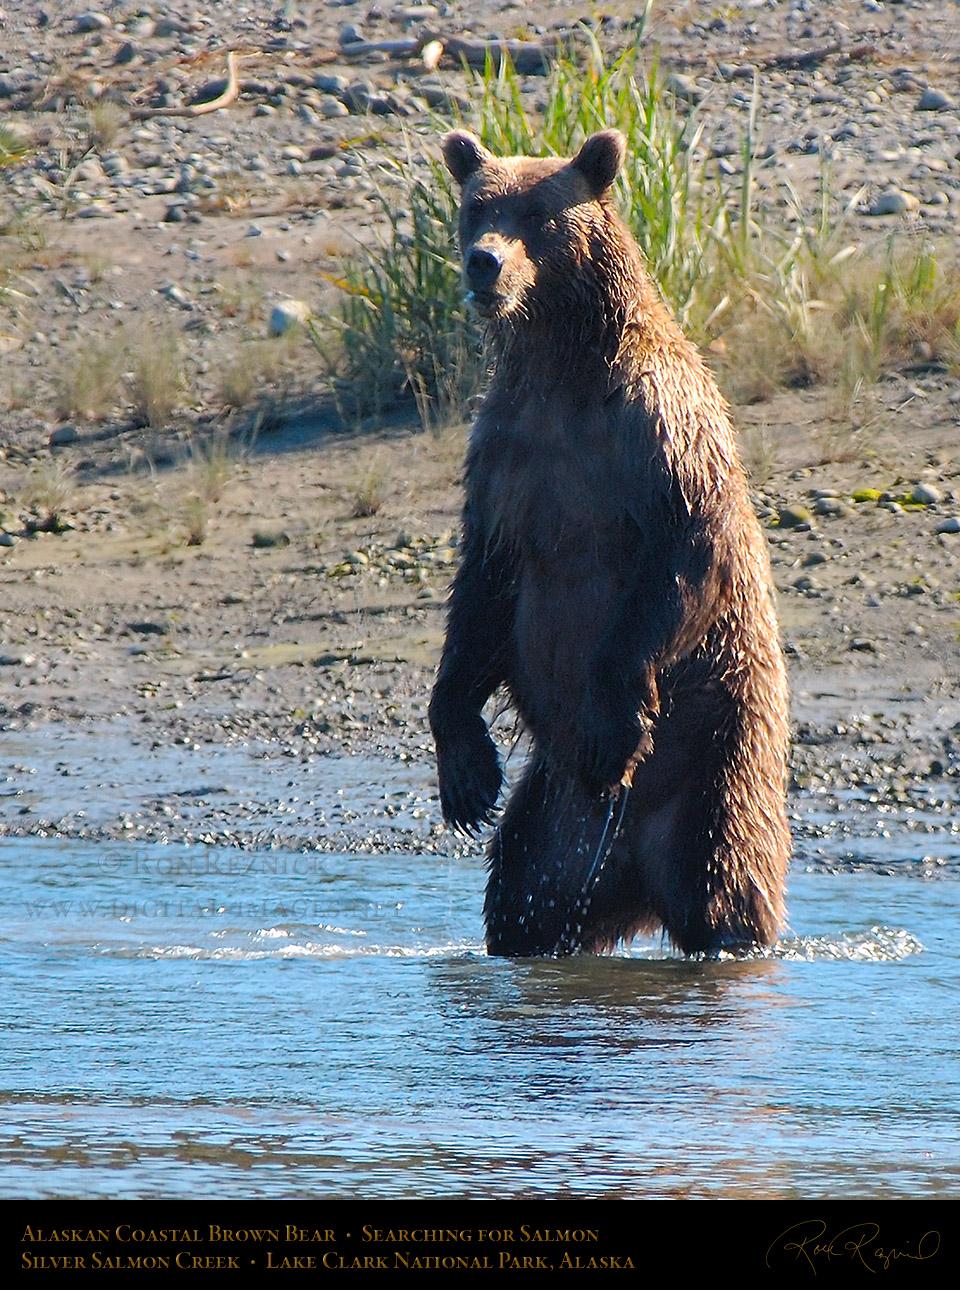 Alaskan Coastal Brown Bear Scenic and Portrait